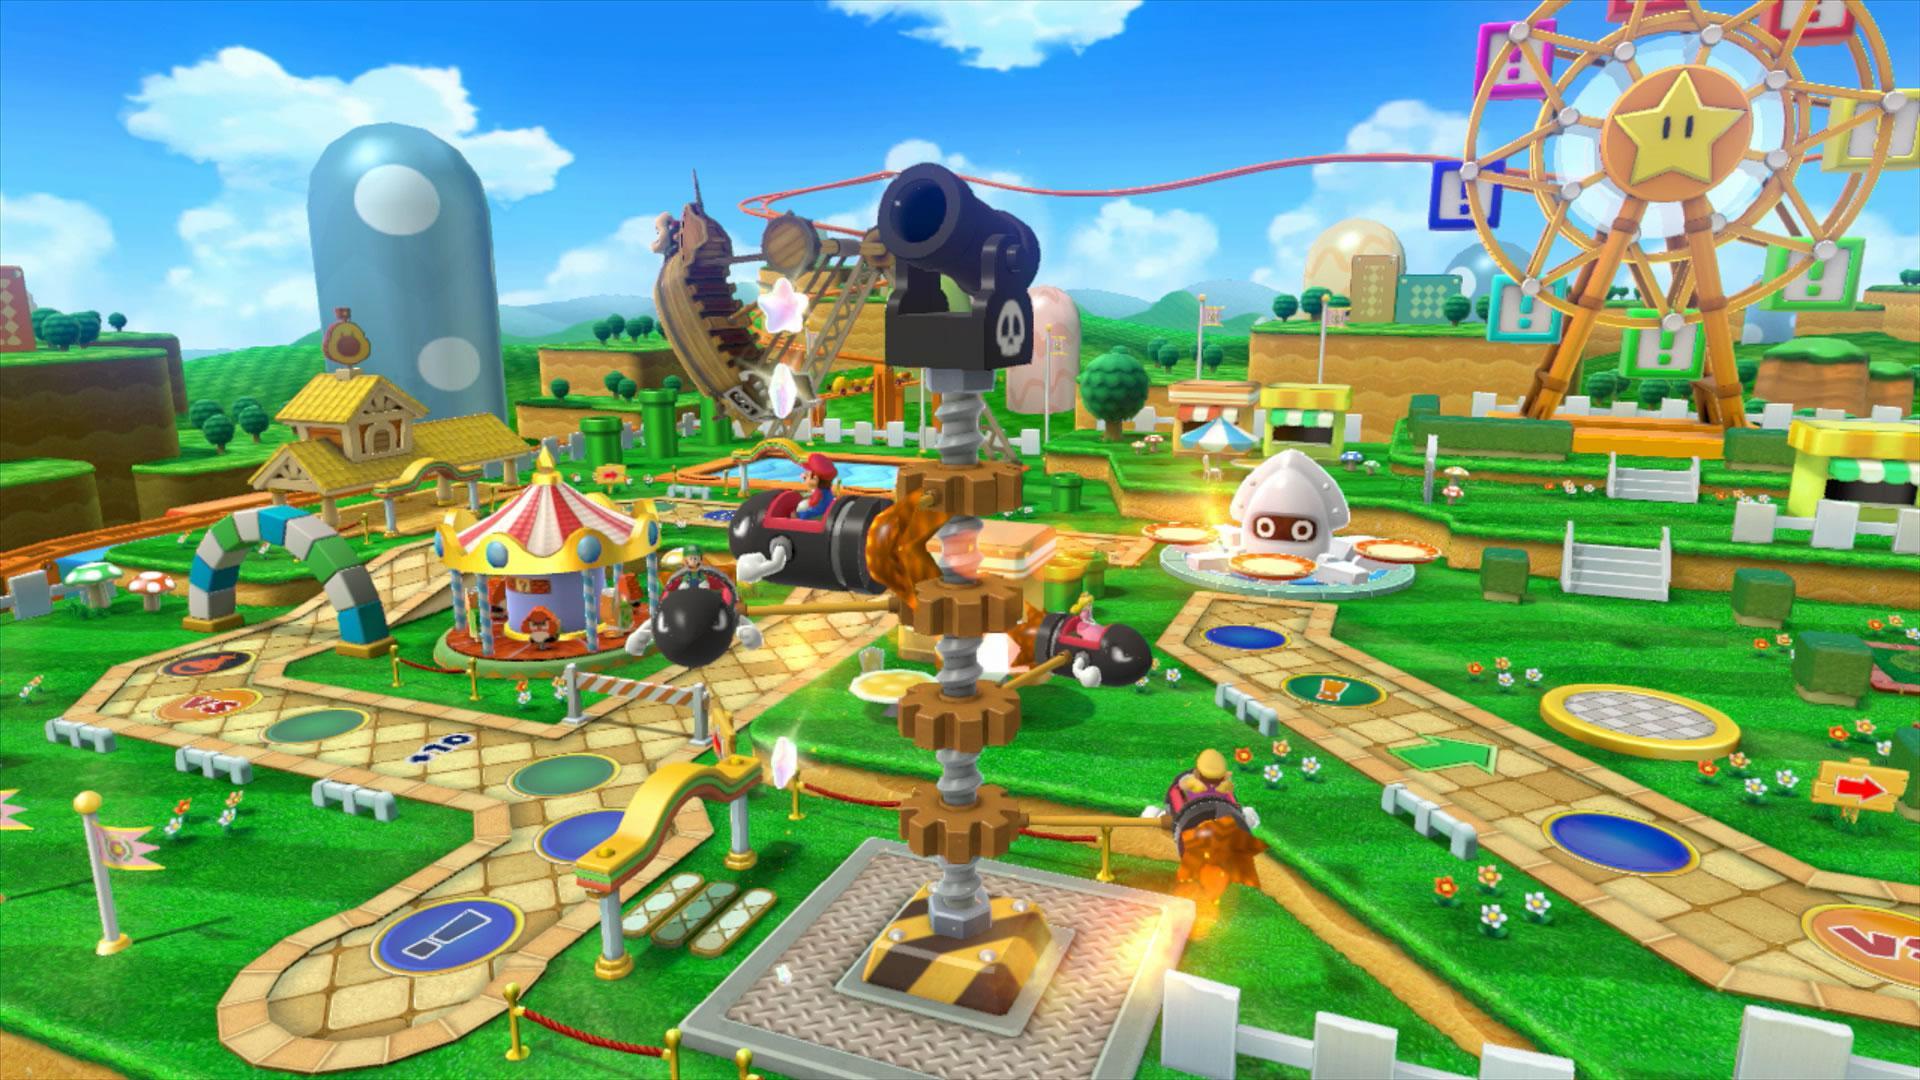 Mario Party 10 Wii U Screenshots